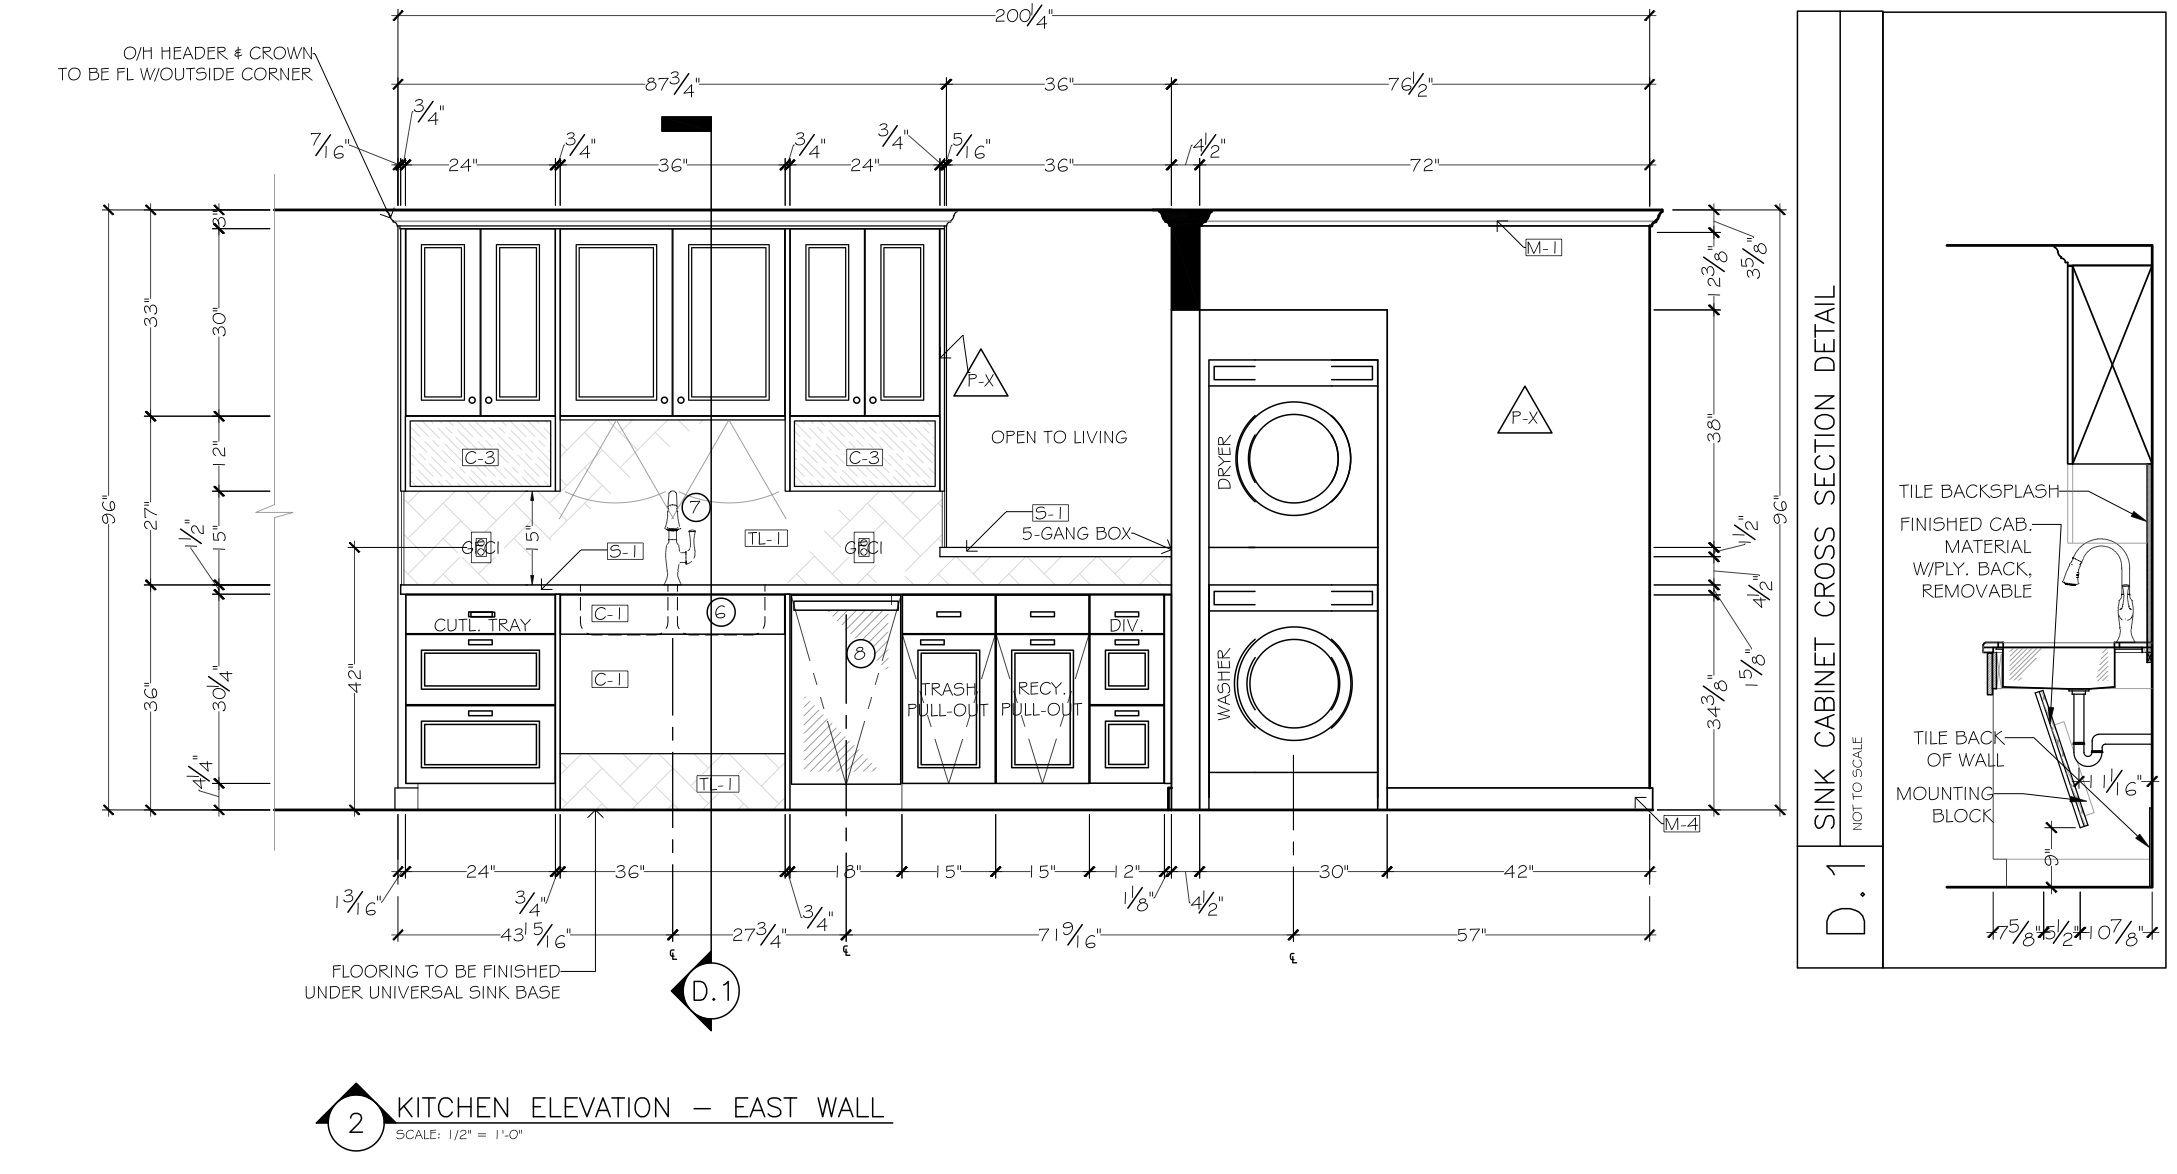 Corey Klassen Interior Design  Kitchen Elevation Example Annotating  Universal Design  (c) 2014